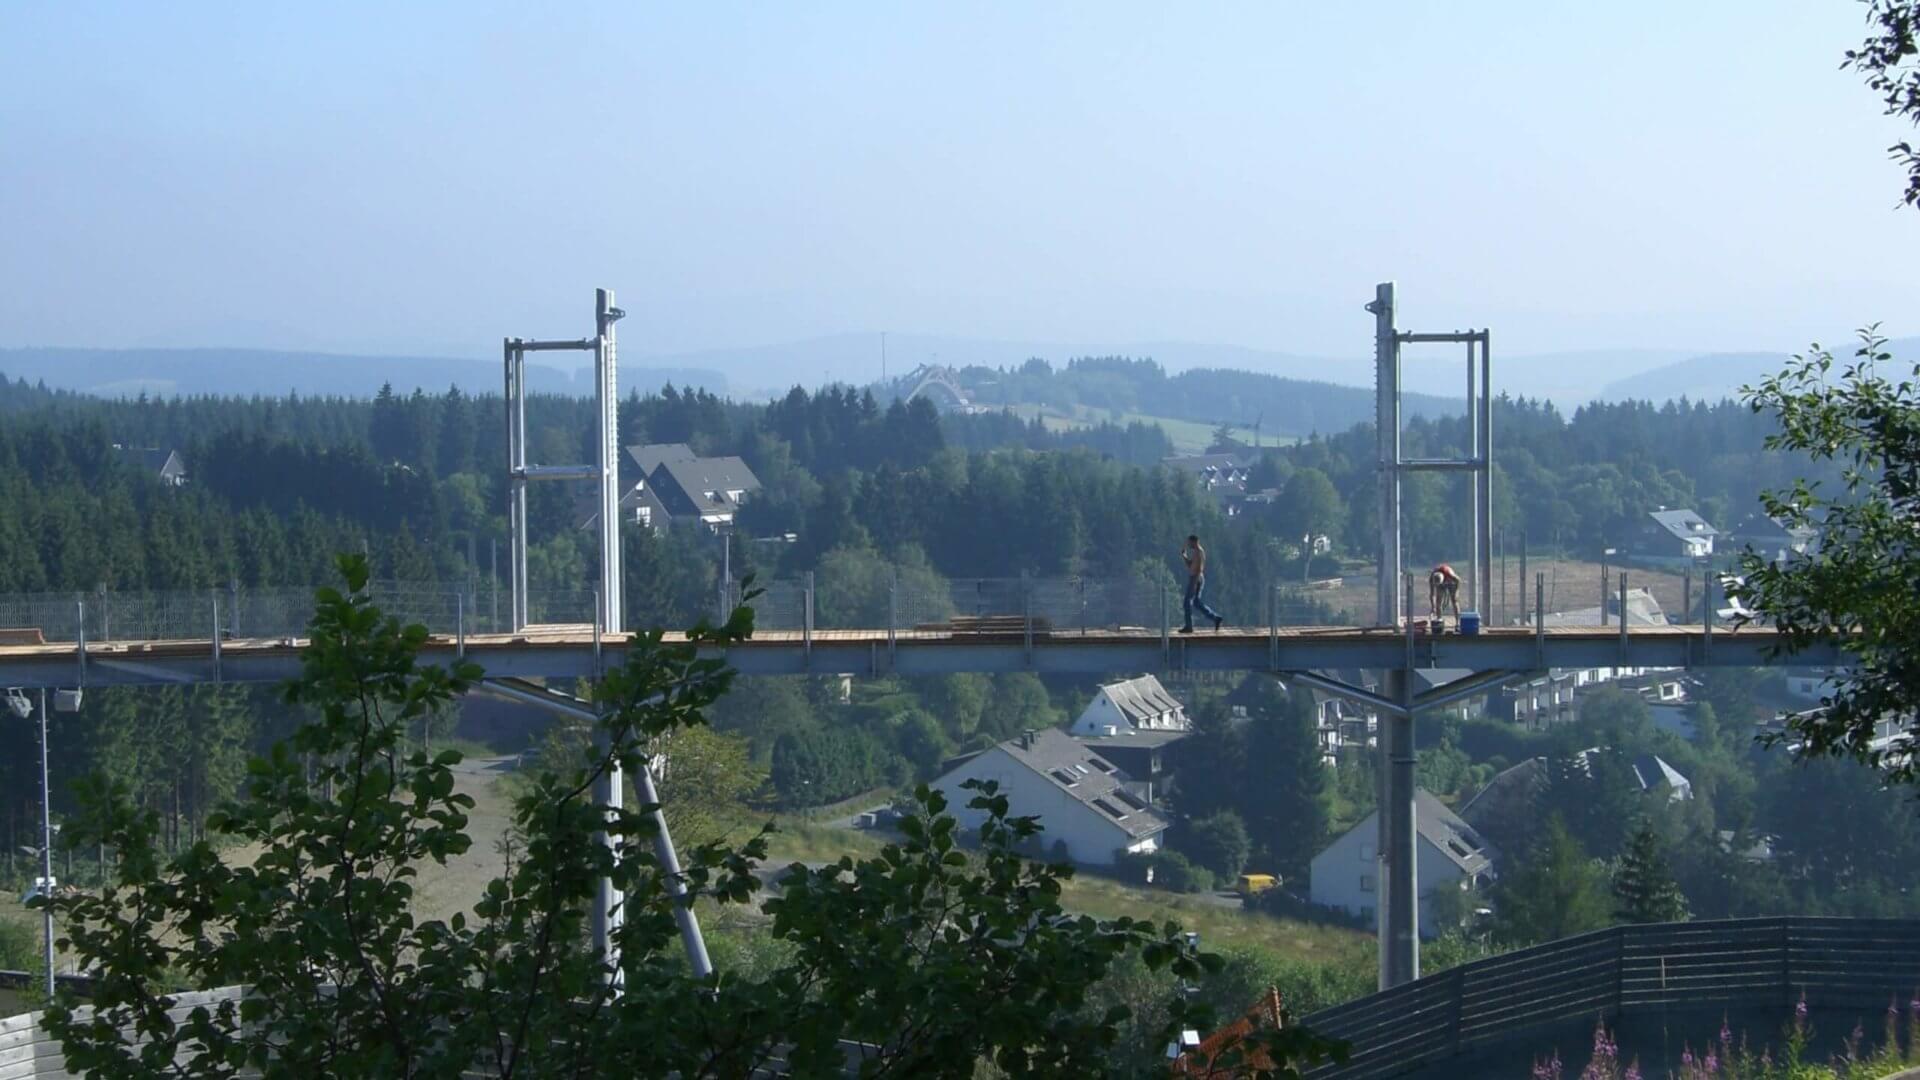 Bau der Panorama Erlebnis Brücke in Winterberg